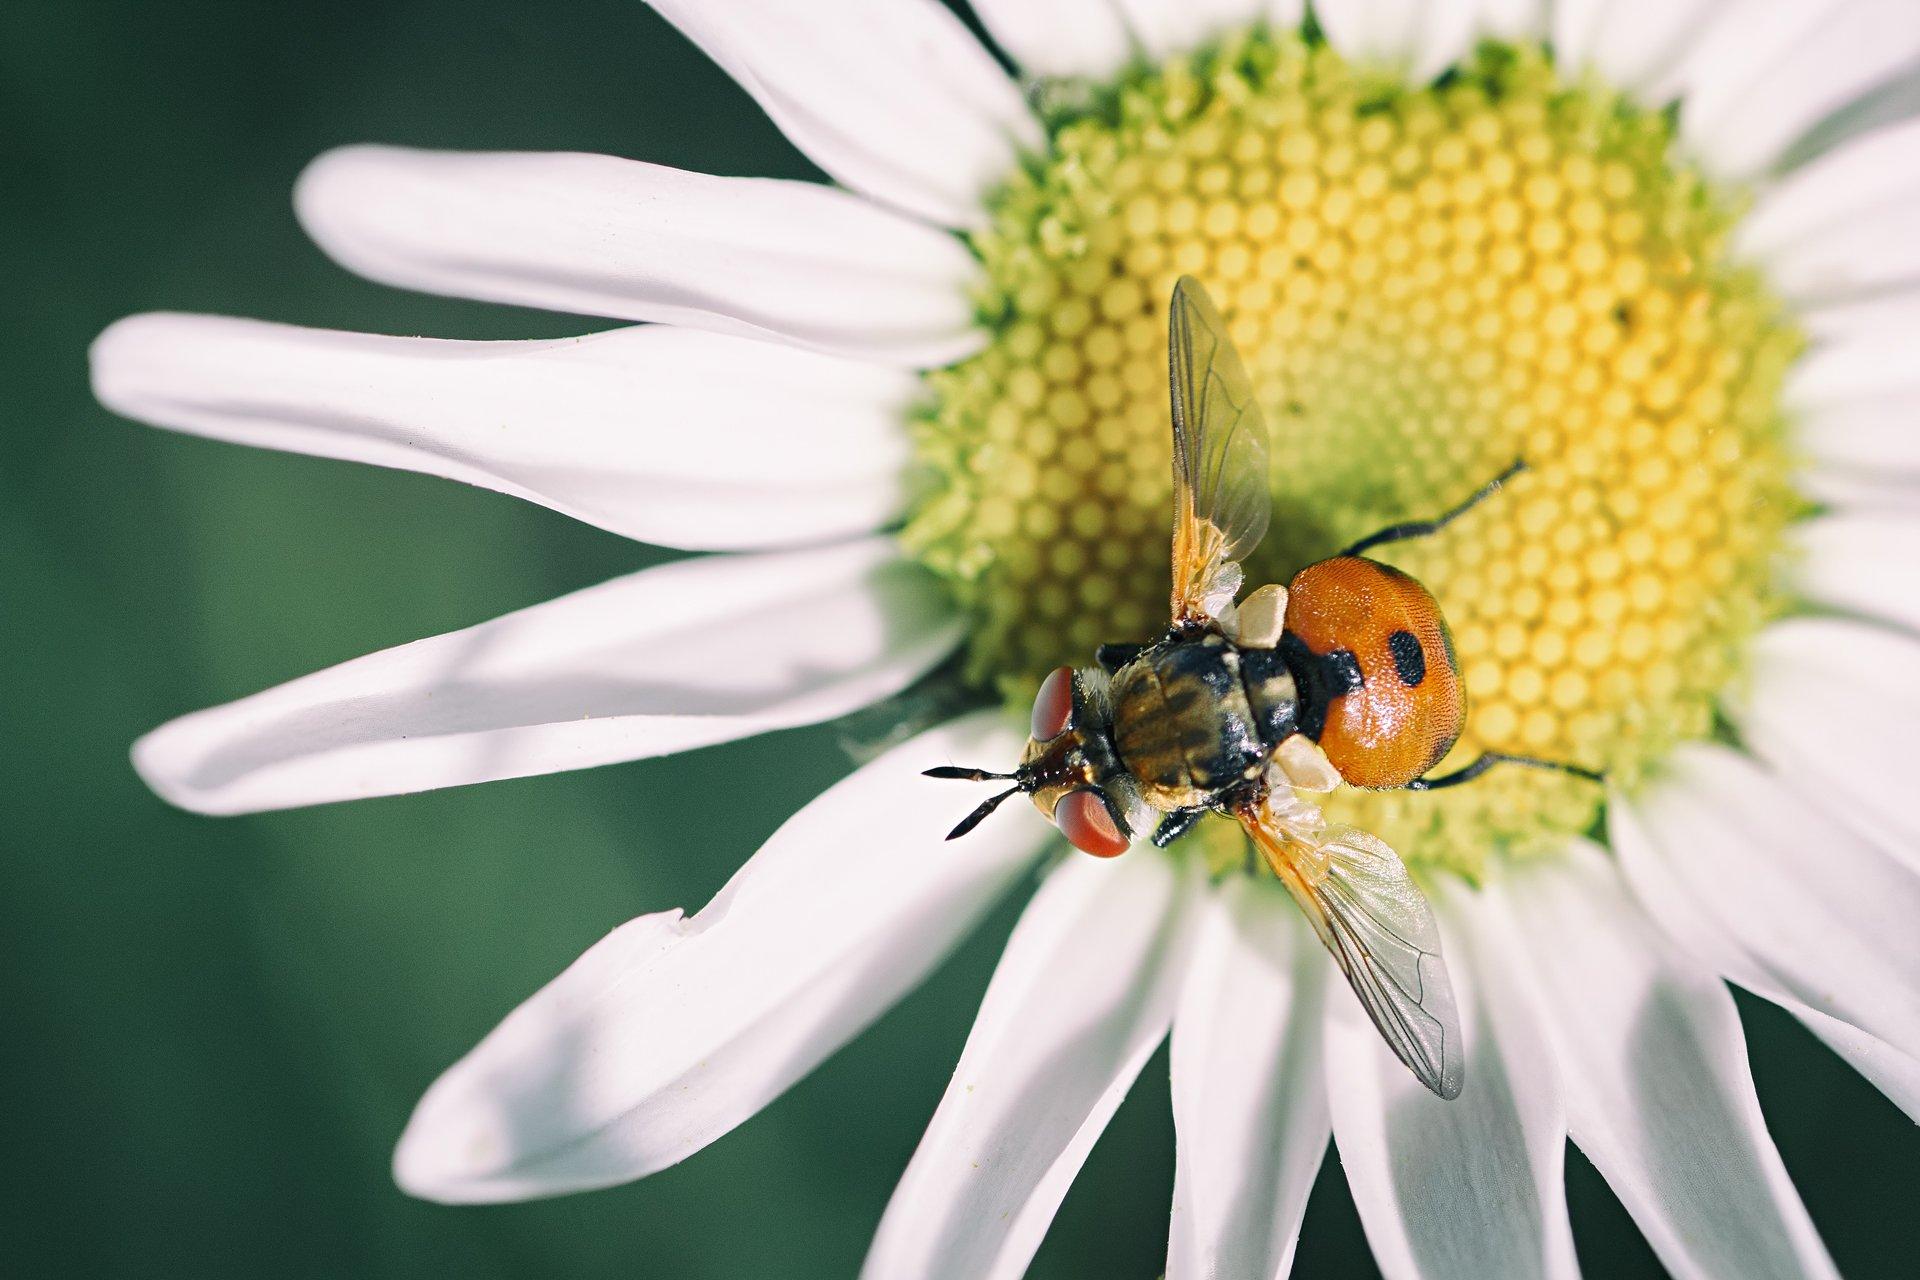 мох,цвет,фон,желтый,семя,цветок,муха, Котов Юрий